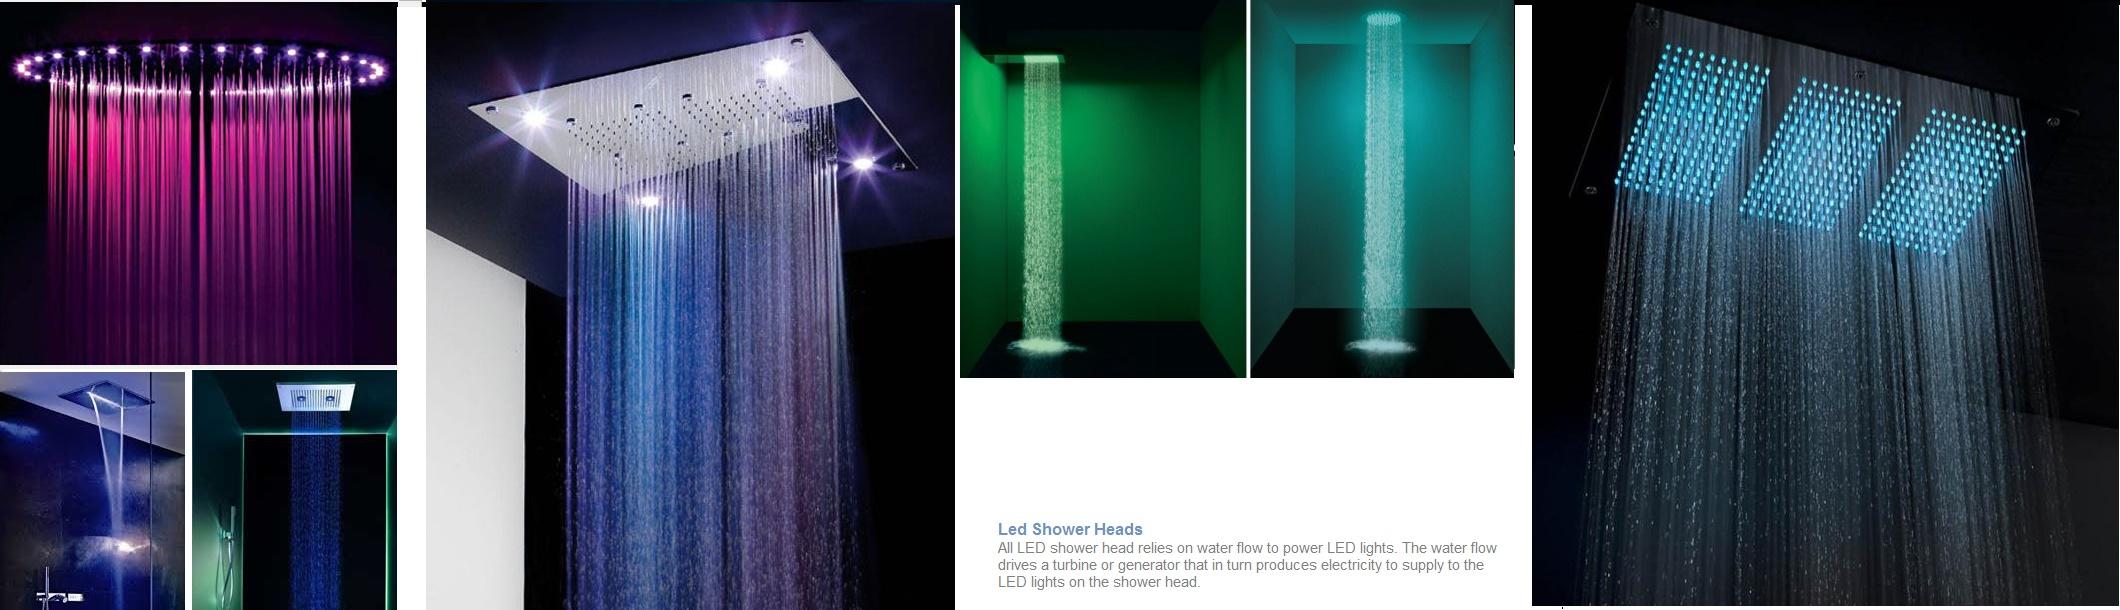 led shower head lights stopped working - Led Shower Head